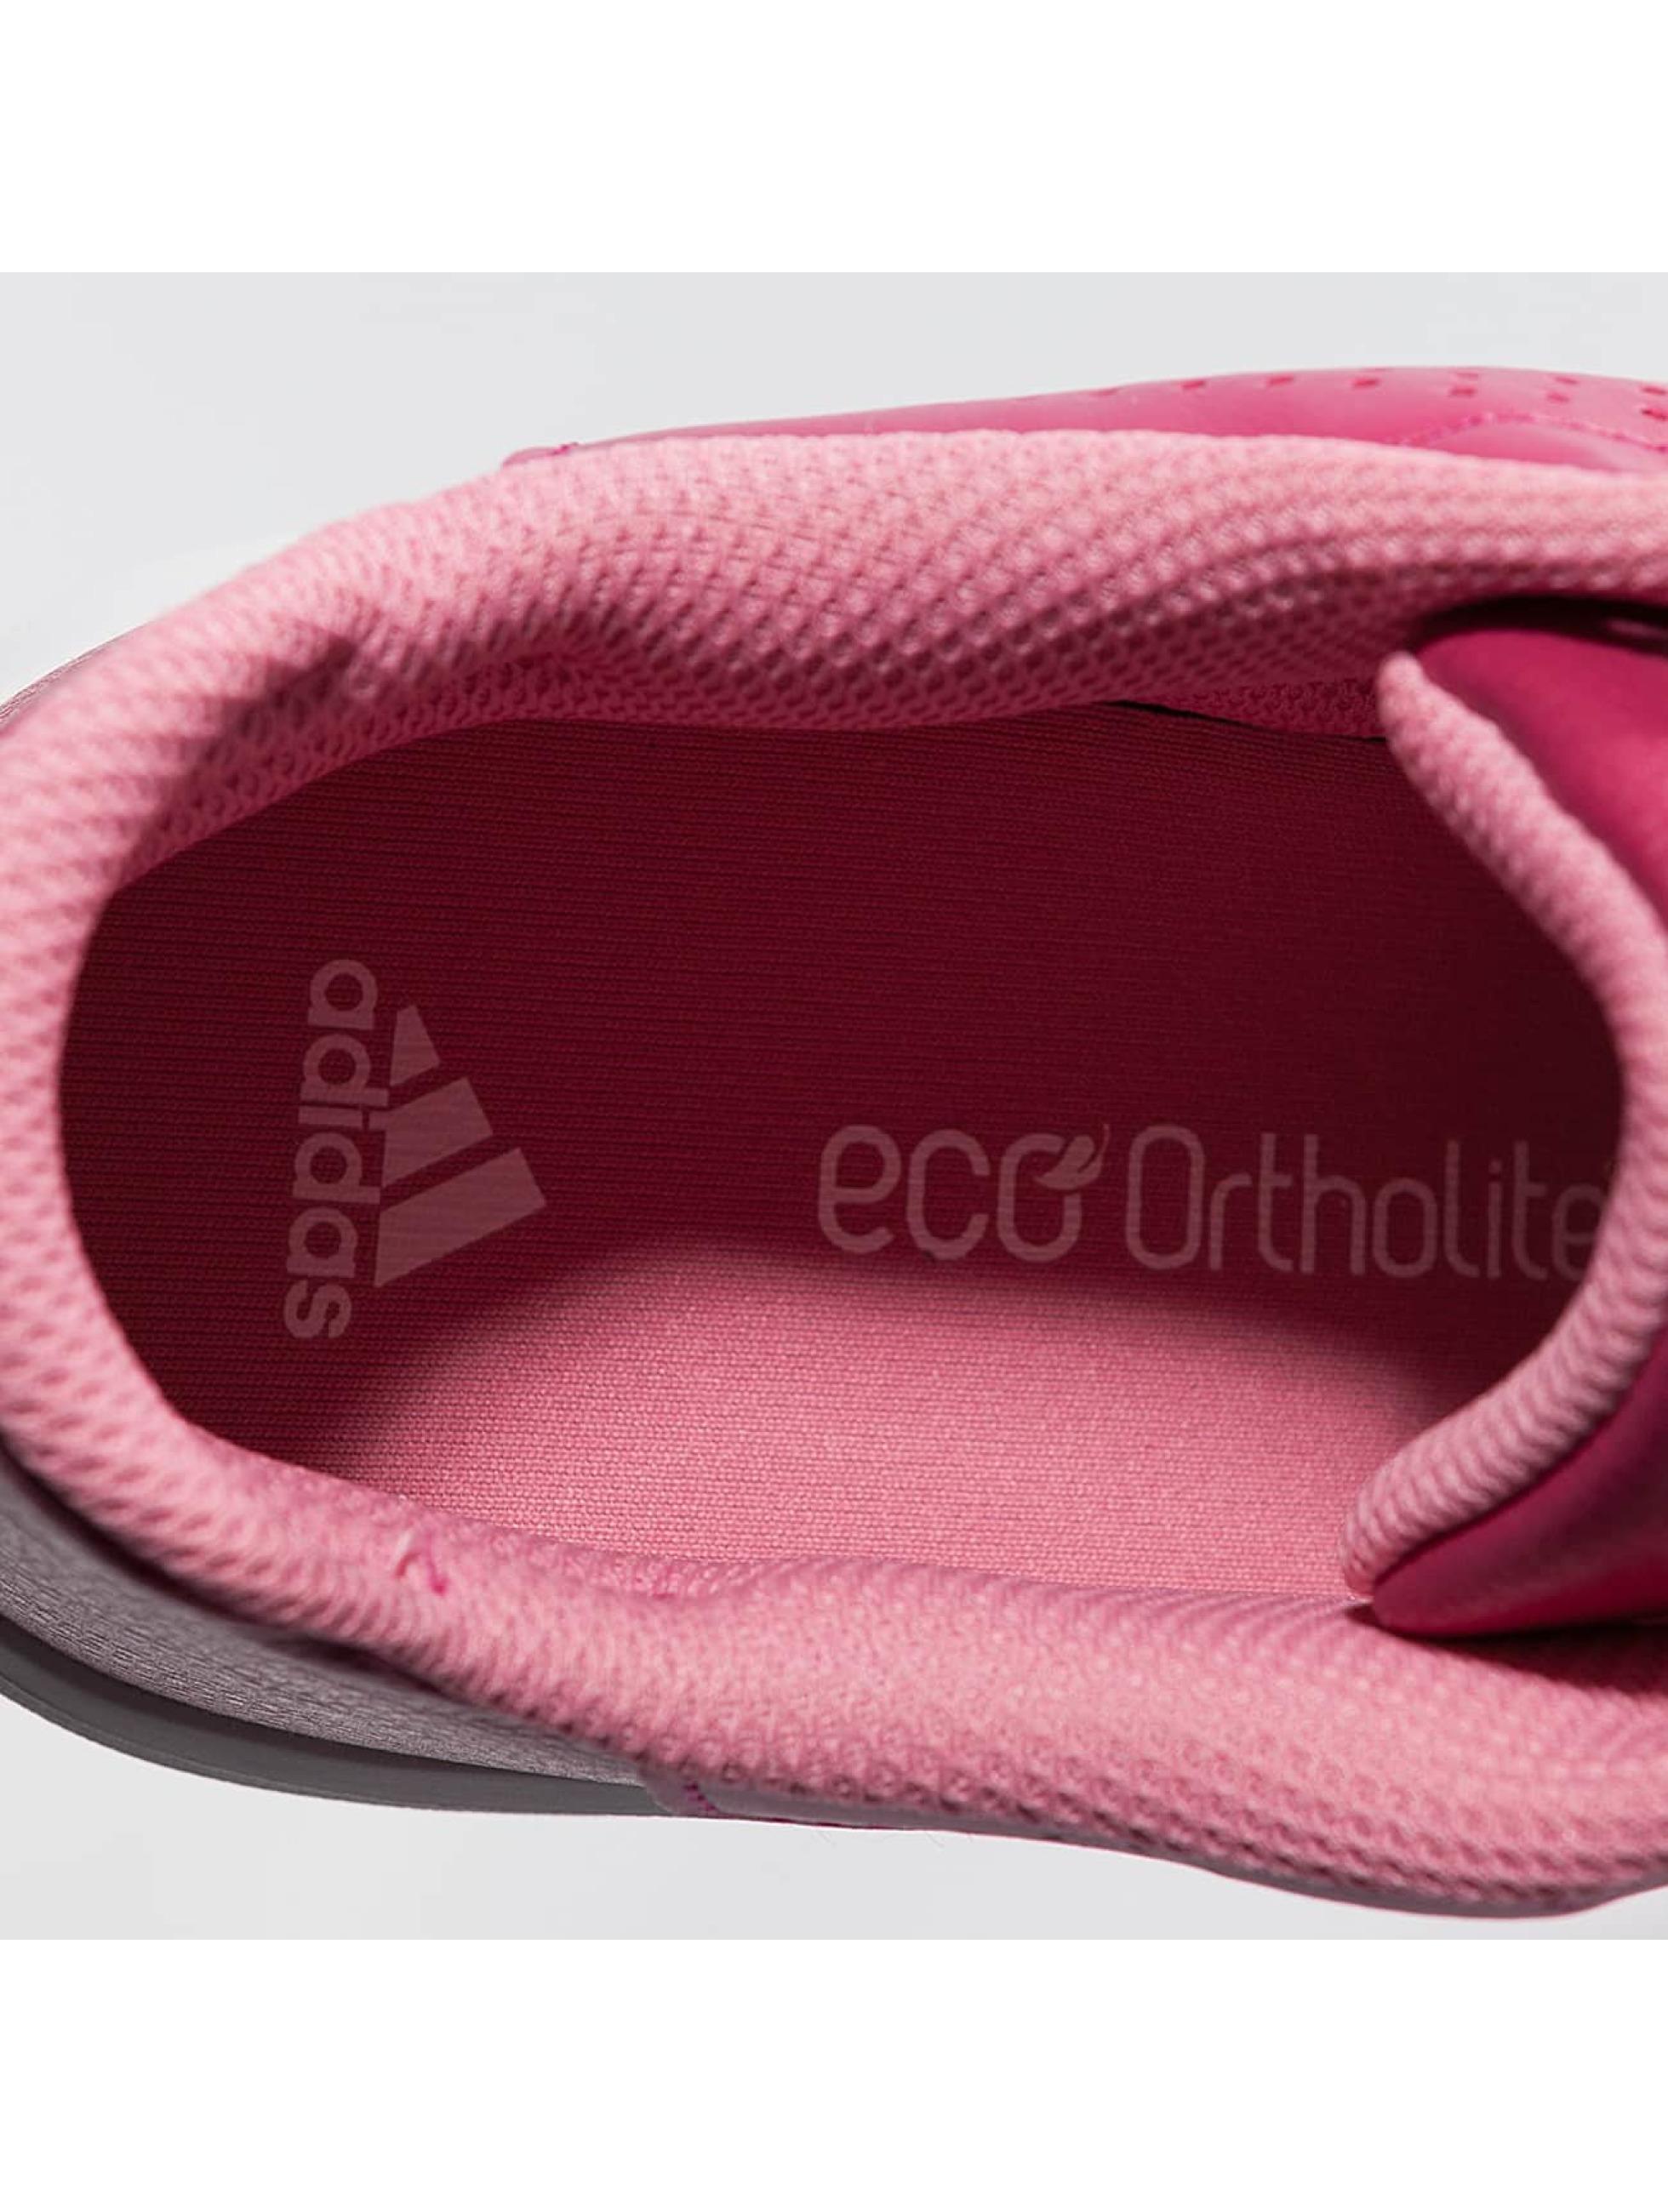 adidas originals Sneakers Alta Sport K pink